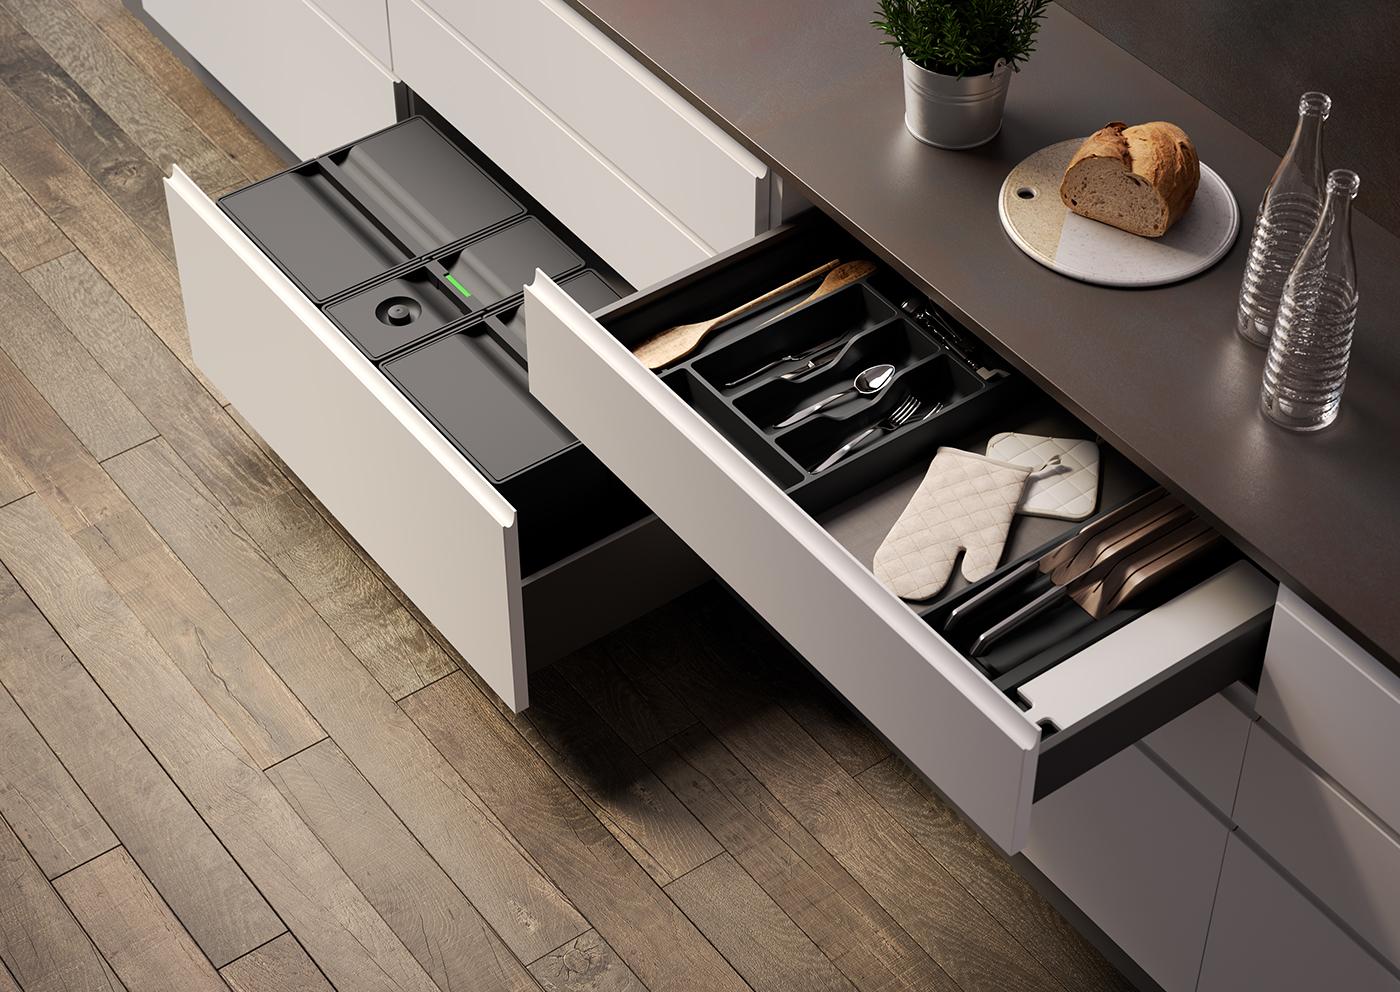 kitchen bathroom accessories rendering Interior design inspire